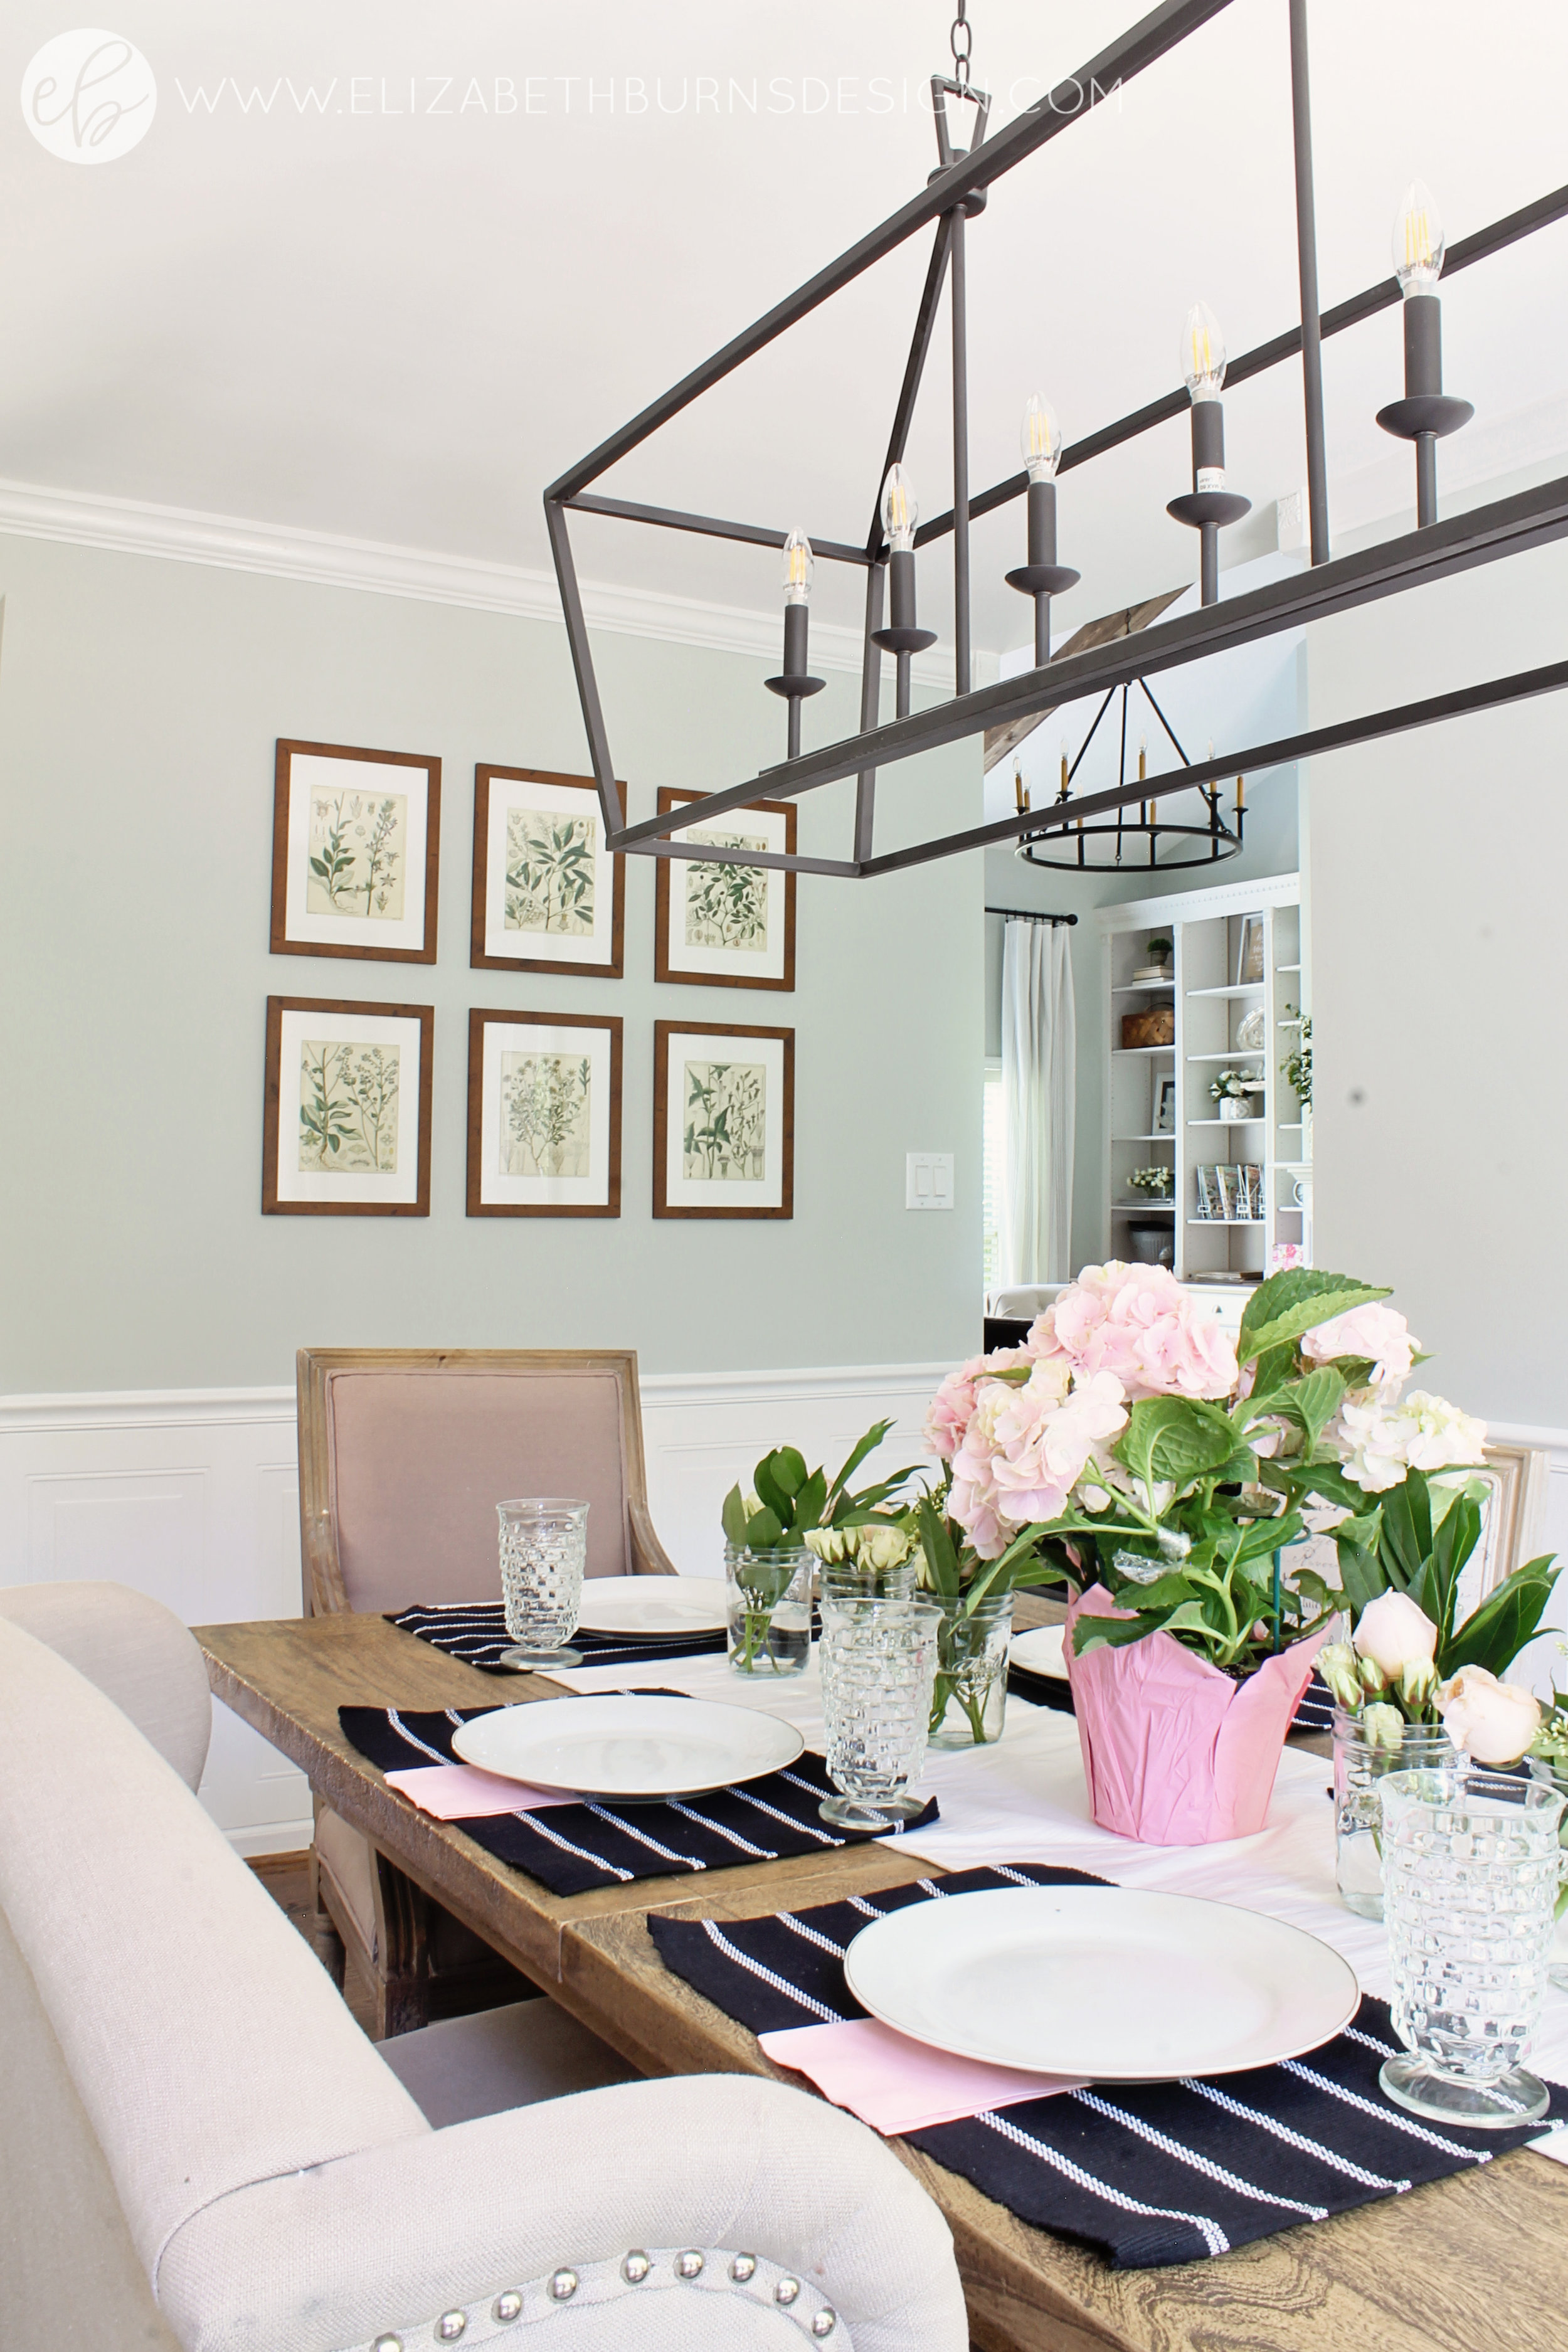 Elizabeth Burns Design - Budget Farmhouse Small Dining Room Sherwin Williams Silver Strand Trestle Table Linen Chairs DIY Wainscoting Dark Walnut Oak Floor (4).jpg